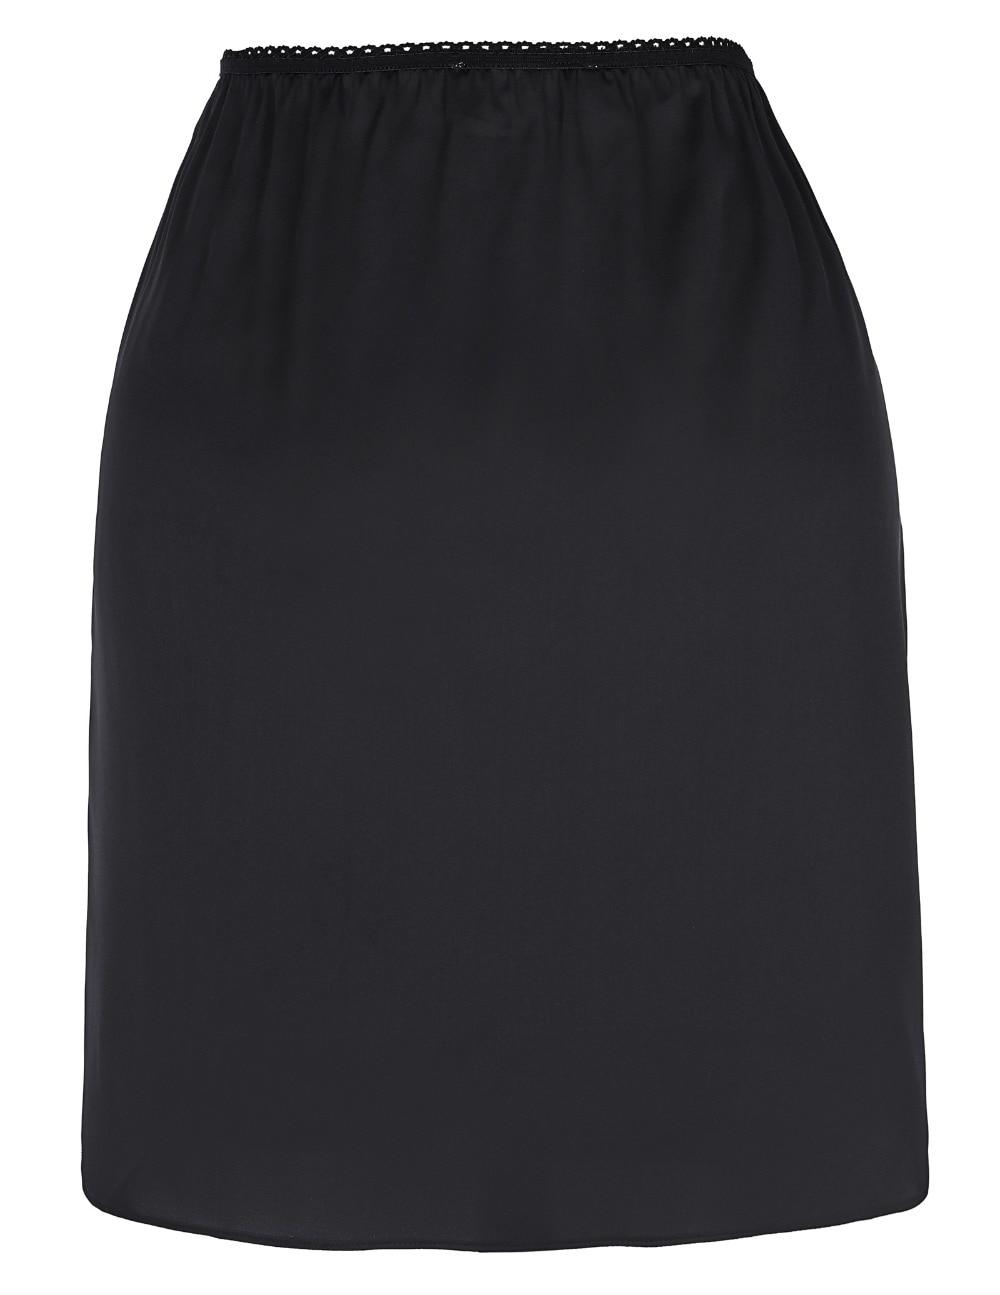 Popular Black Satin Pencil Skirt-Buy Cheap Black Satin Pencil ...